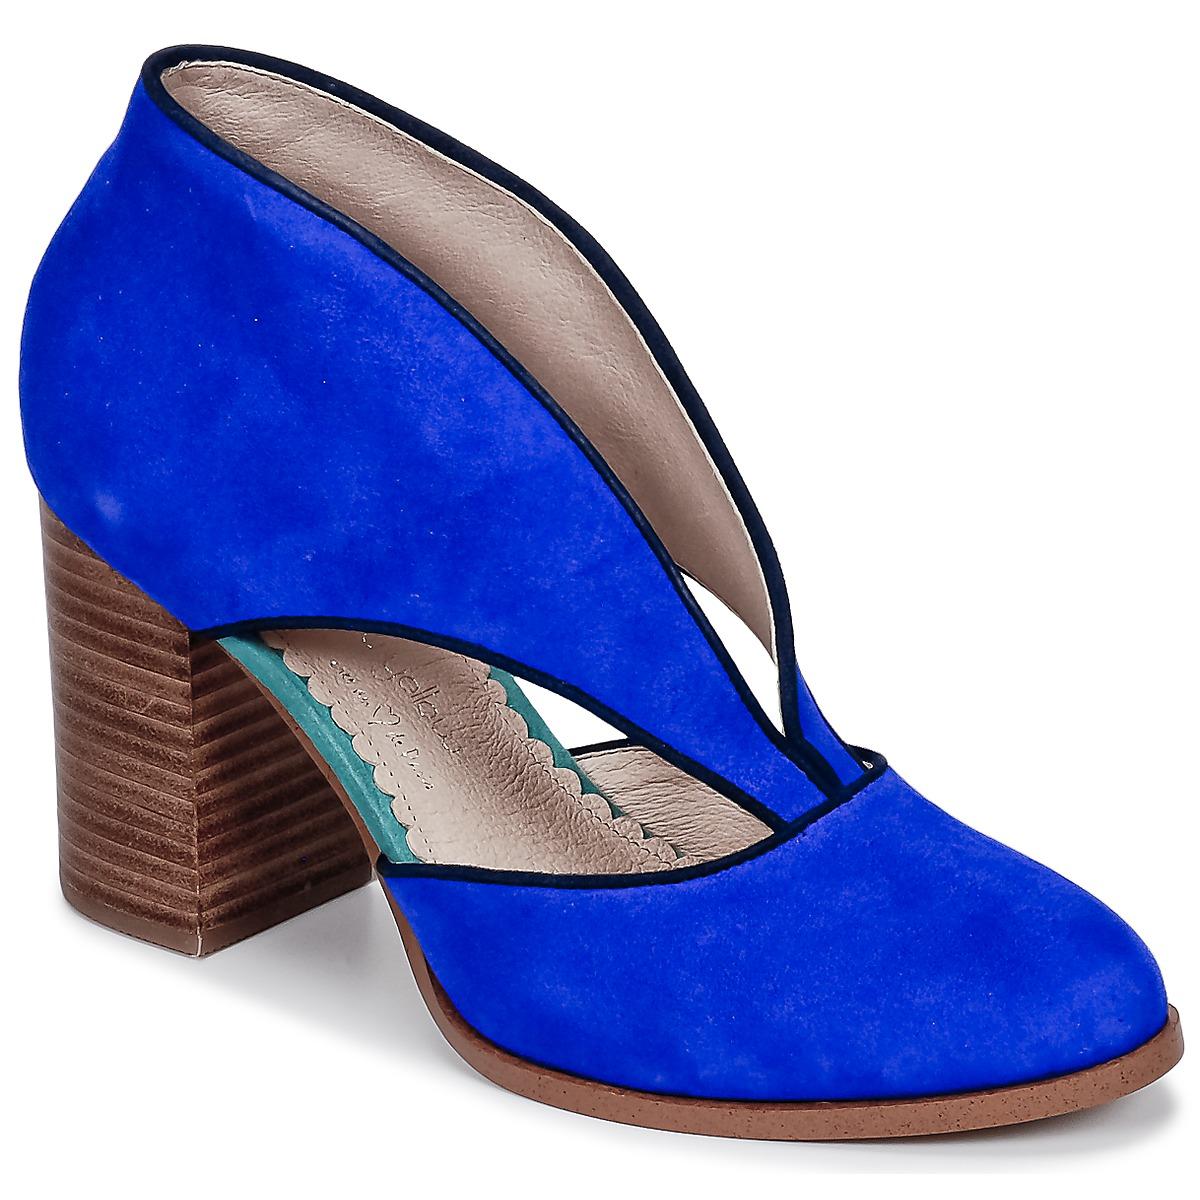 Mellow Yellow DADYLOUNA Blau - Kostenloser Versand bei Spartoode ! - Schuhe Low Boots Damen 119,20 €